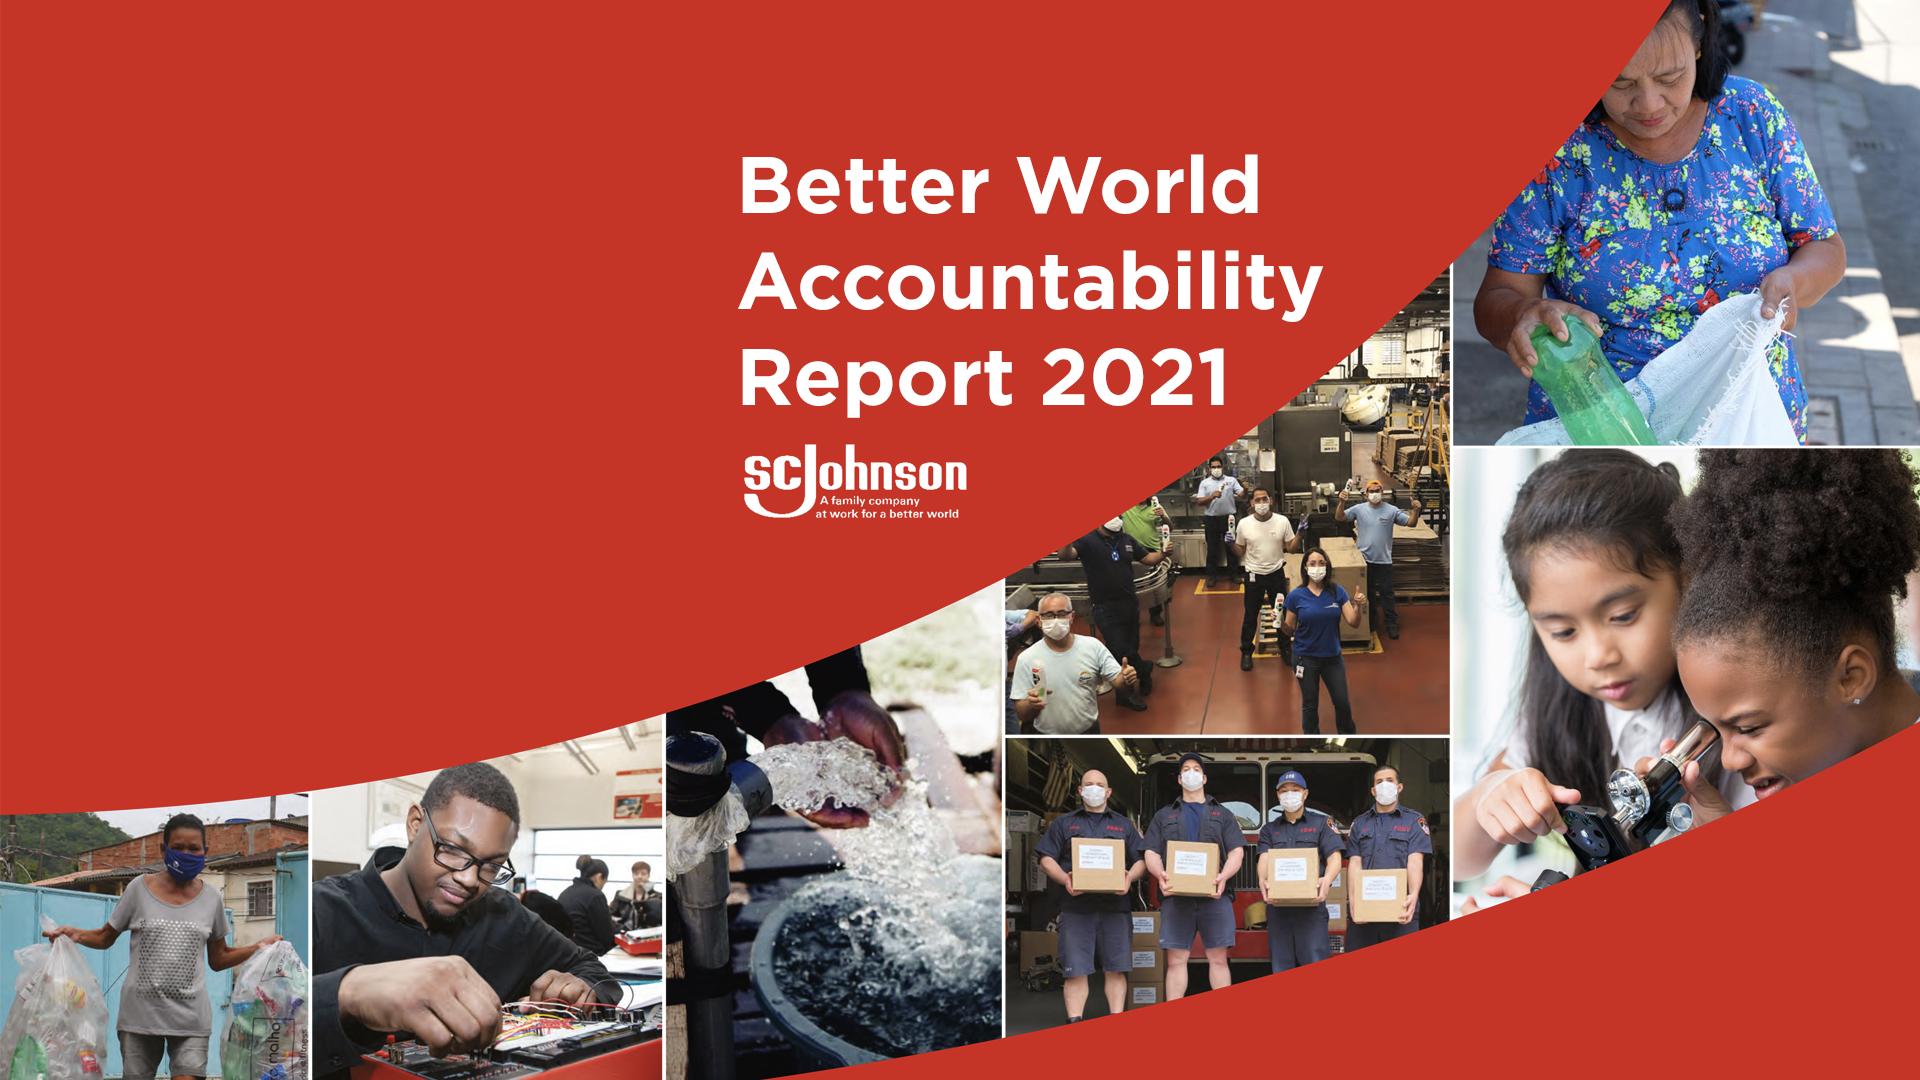 A Better World Accountability Report